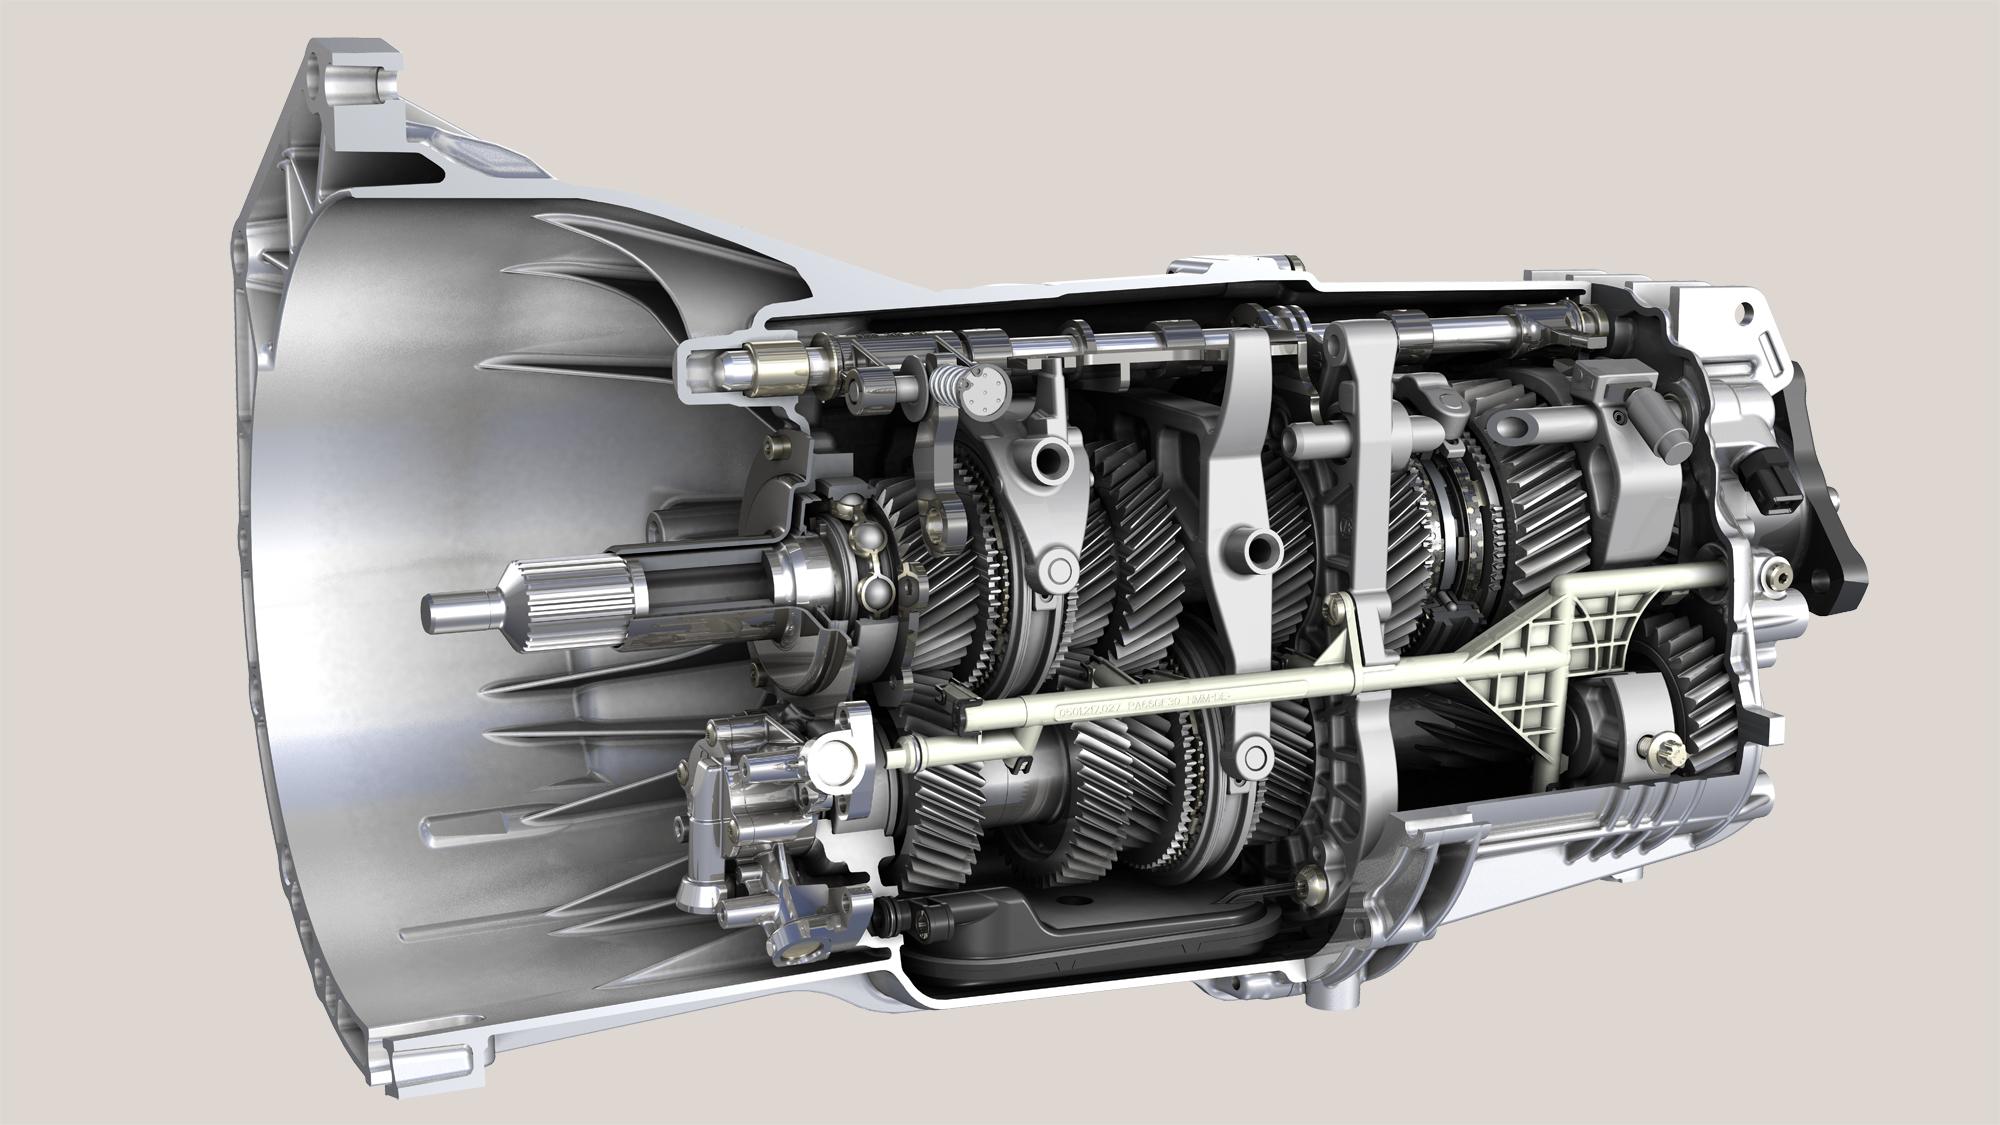 2003 dodge ram 1500 parts diagram 2001 mercury cougar fuse box magna buys transmission maker getrag for $1.9 billion - autoevolution